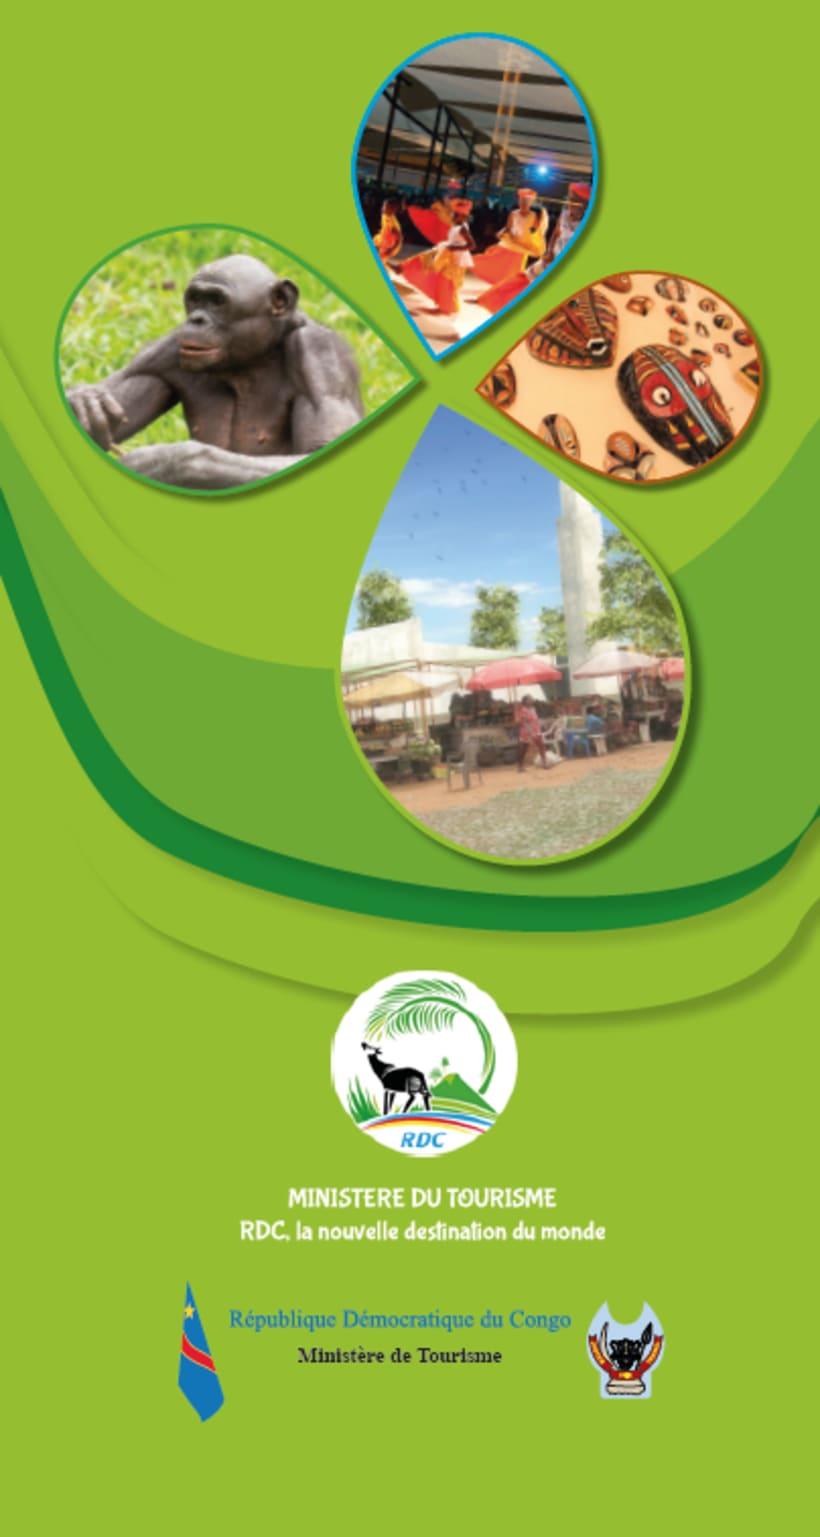 Tríptico promoción turística RDC 1